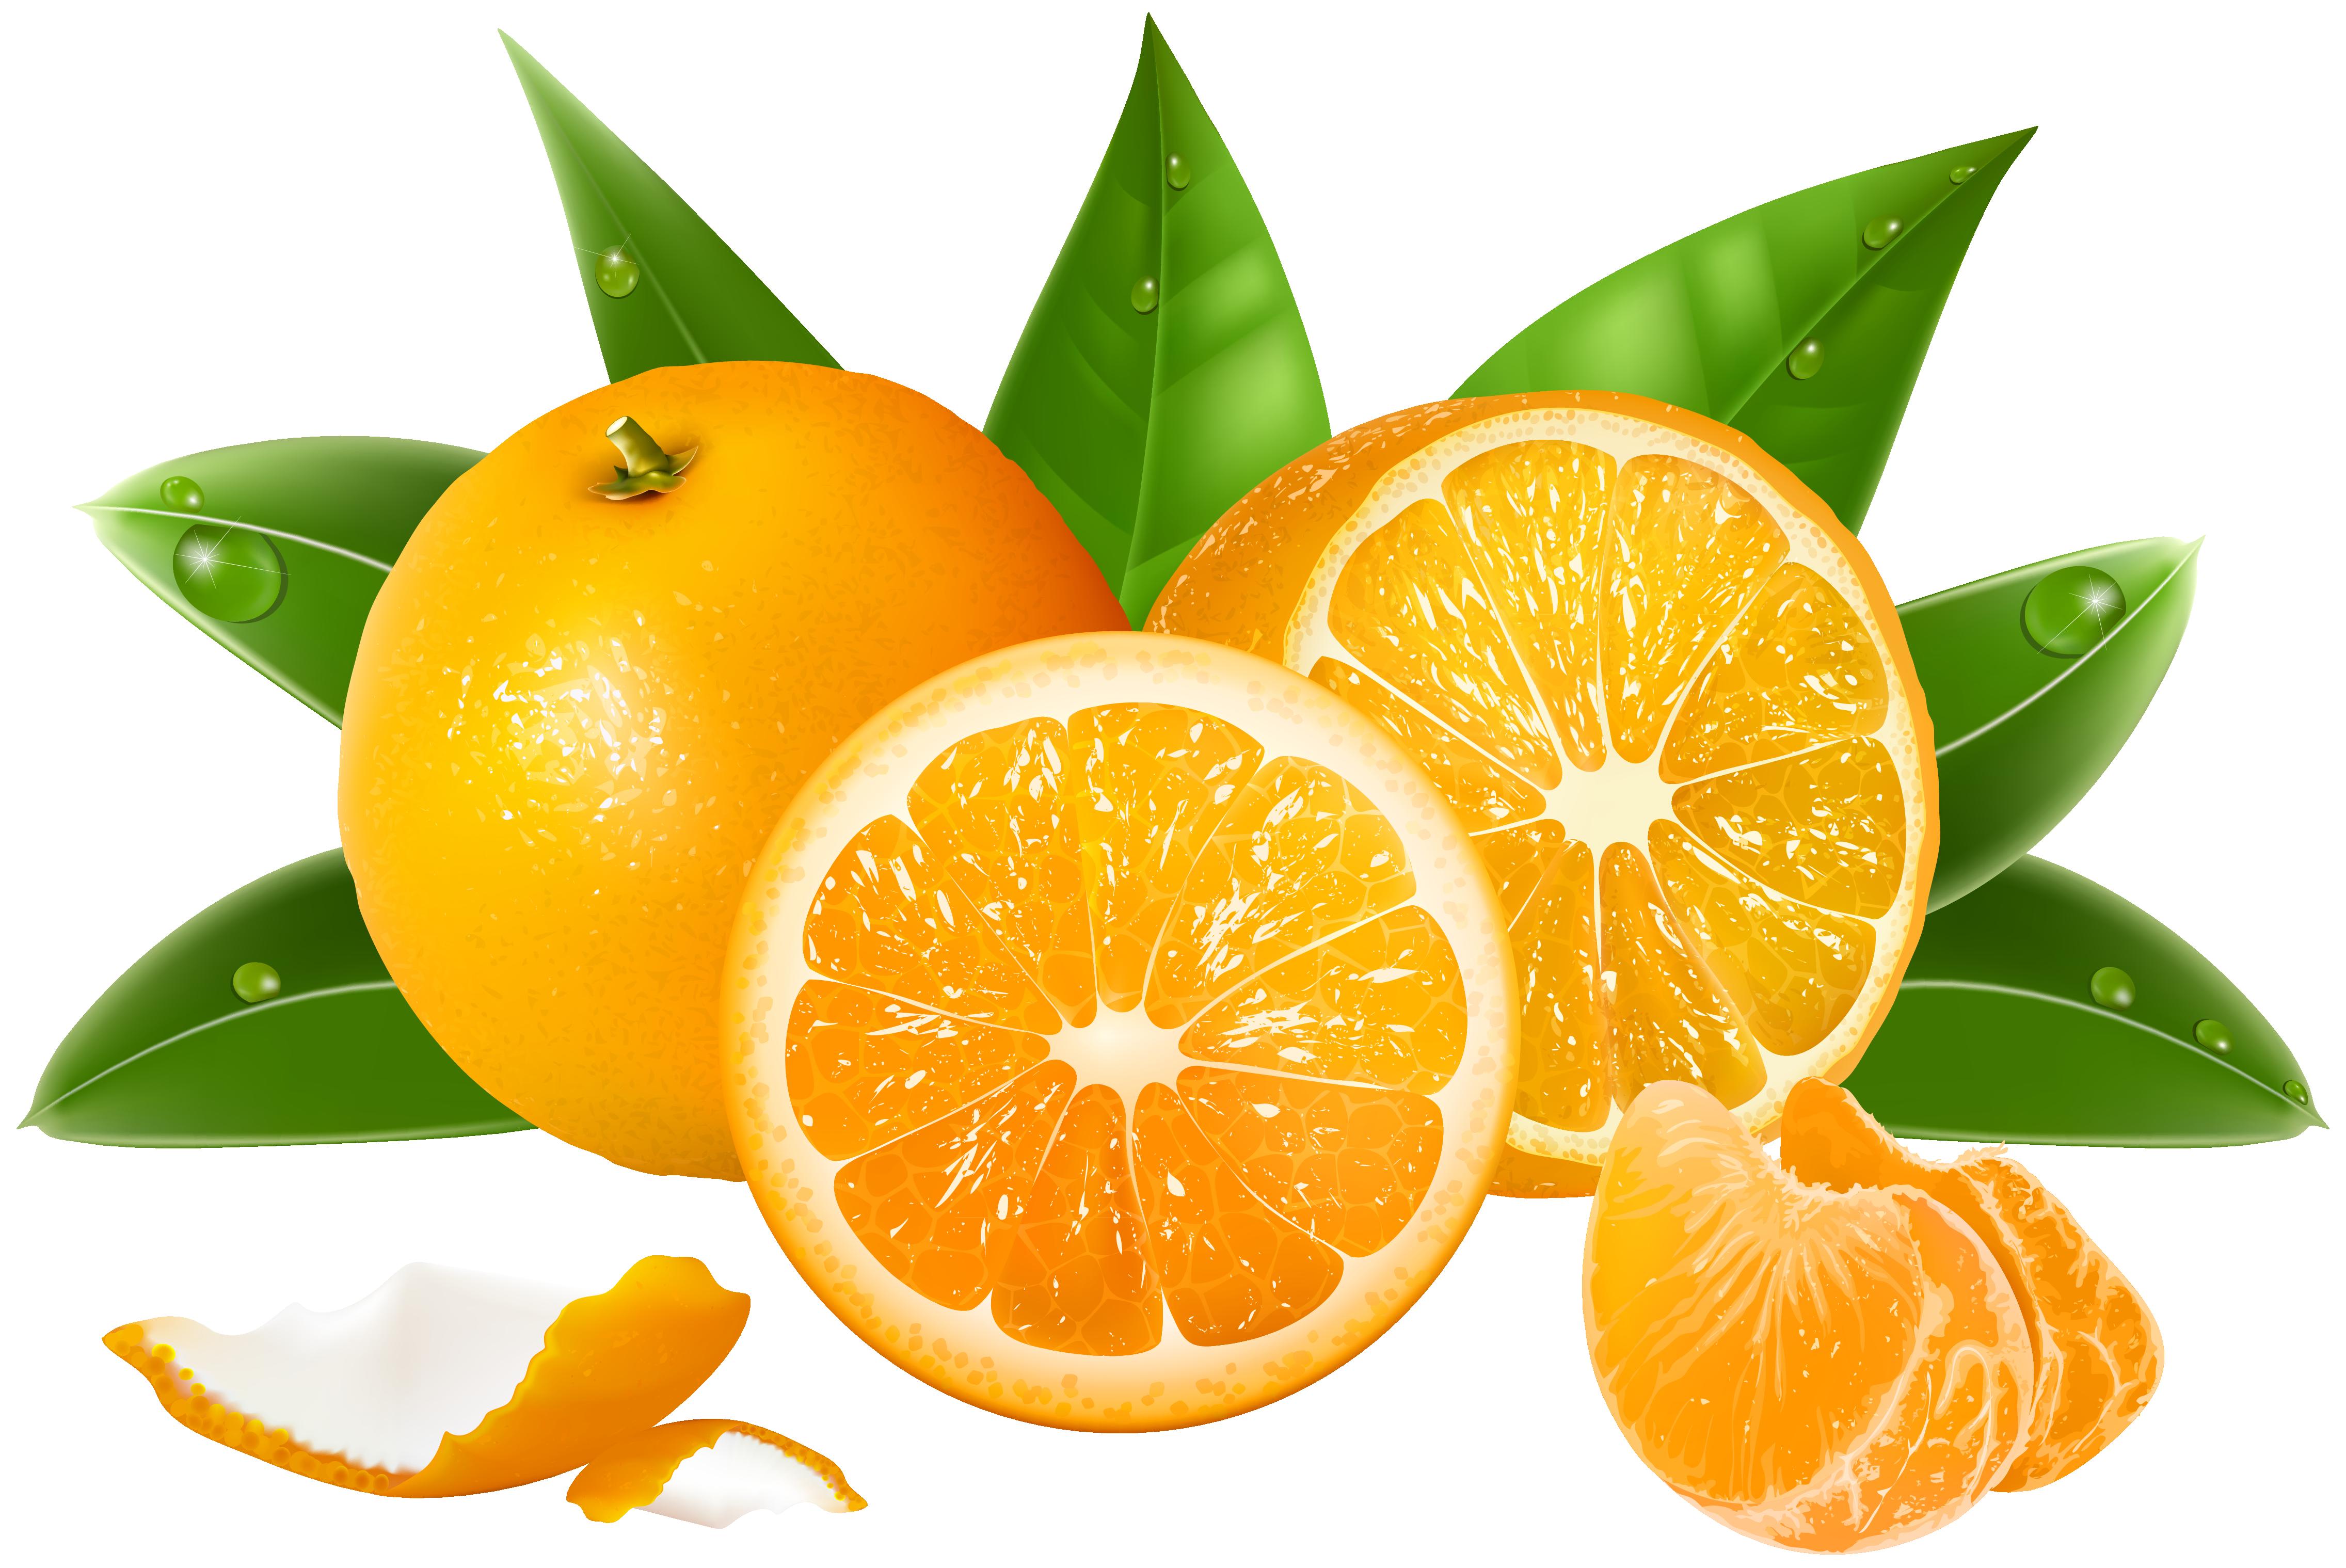 Juice Lemon Grapefruit Orange